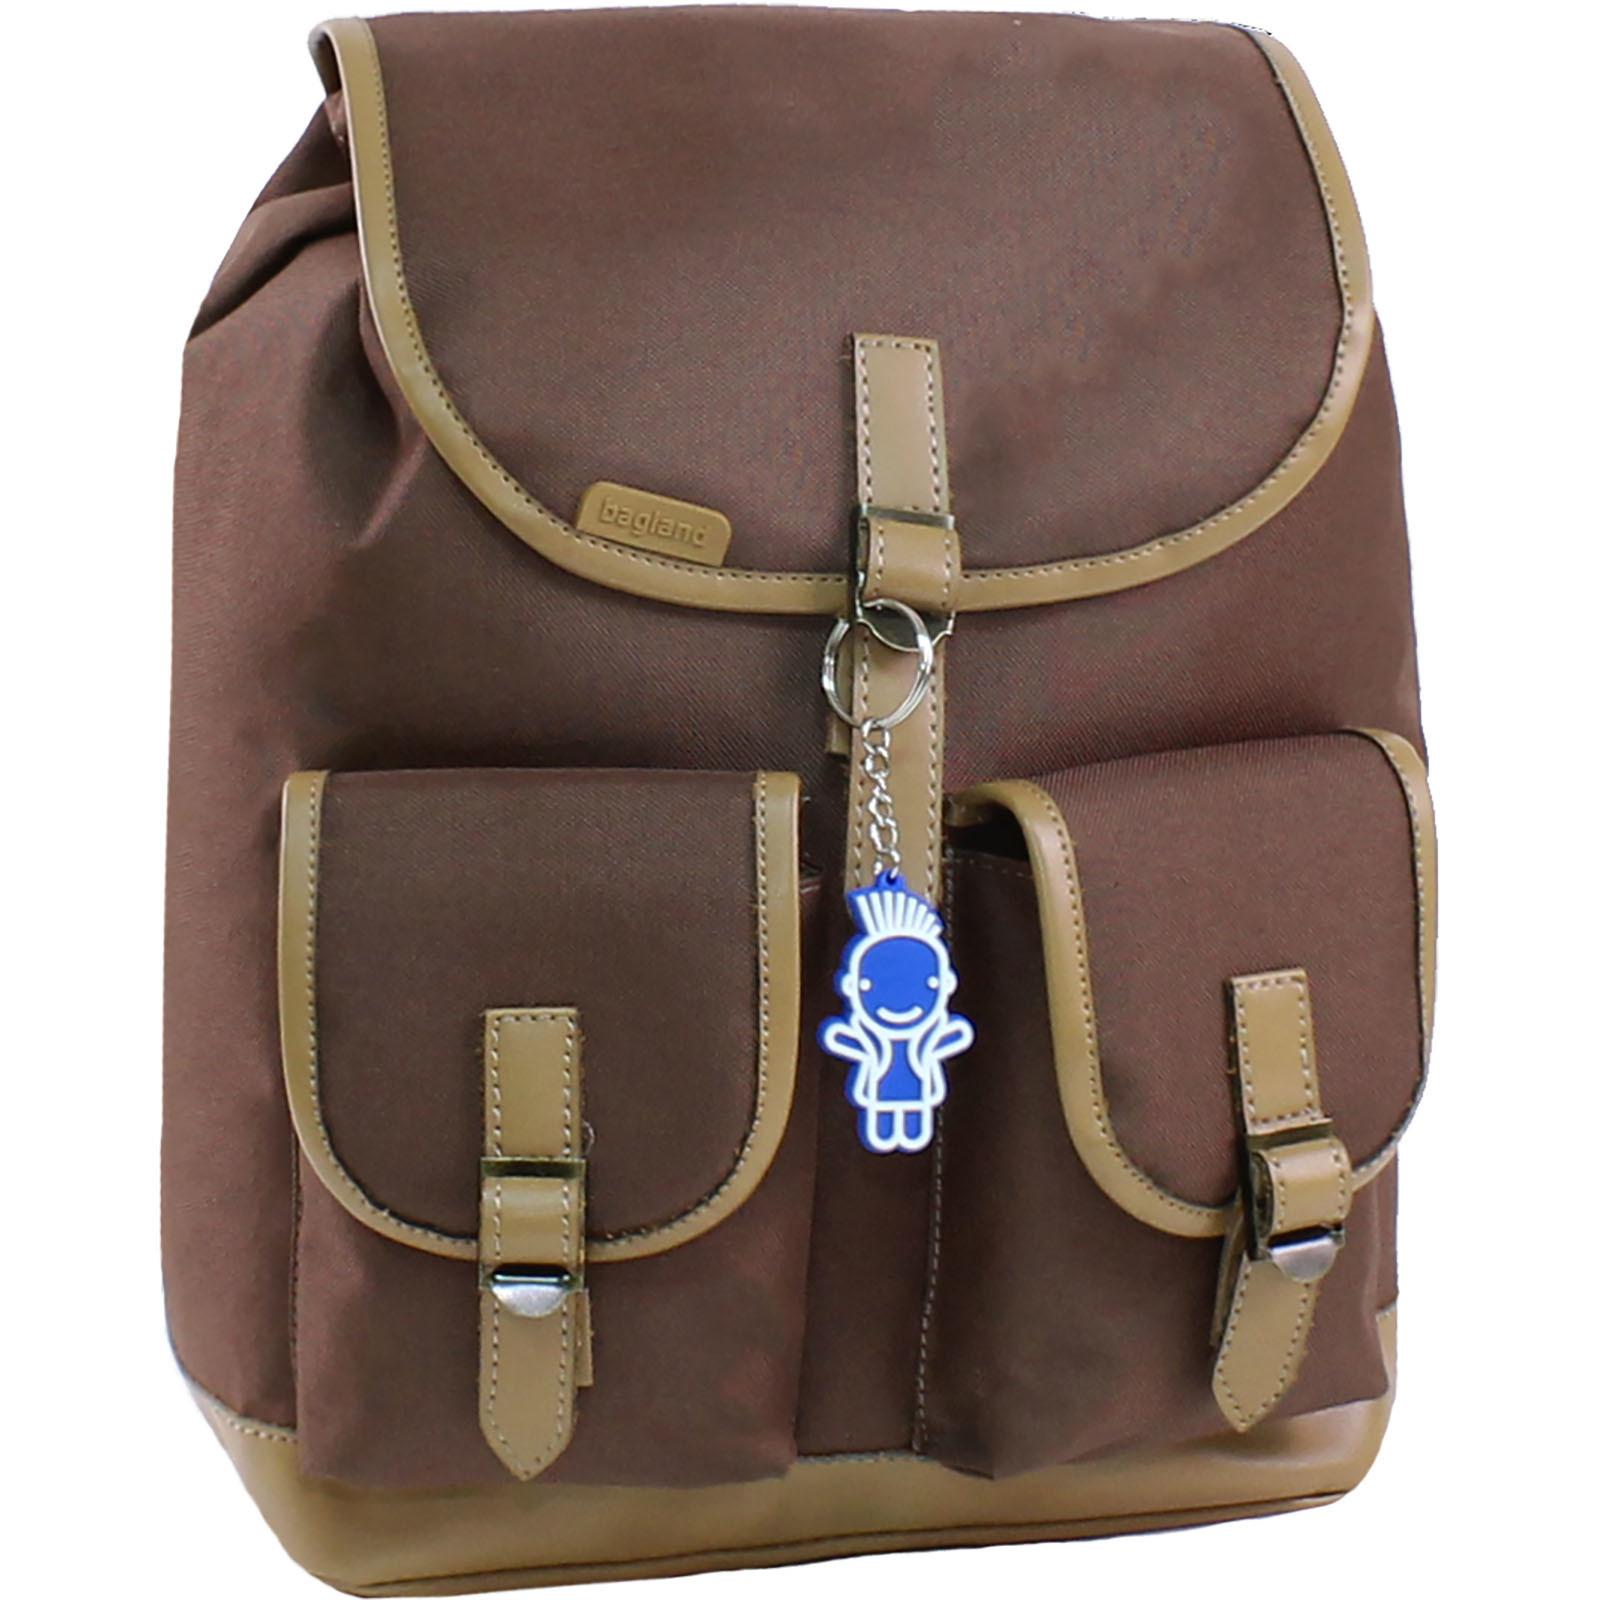 Рюкзак Bagland Amy 16 л. 299 коричневий (0013066) фото 1